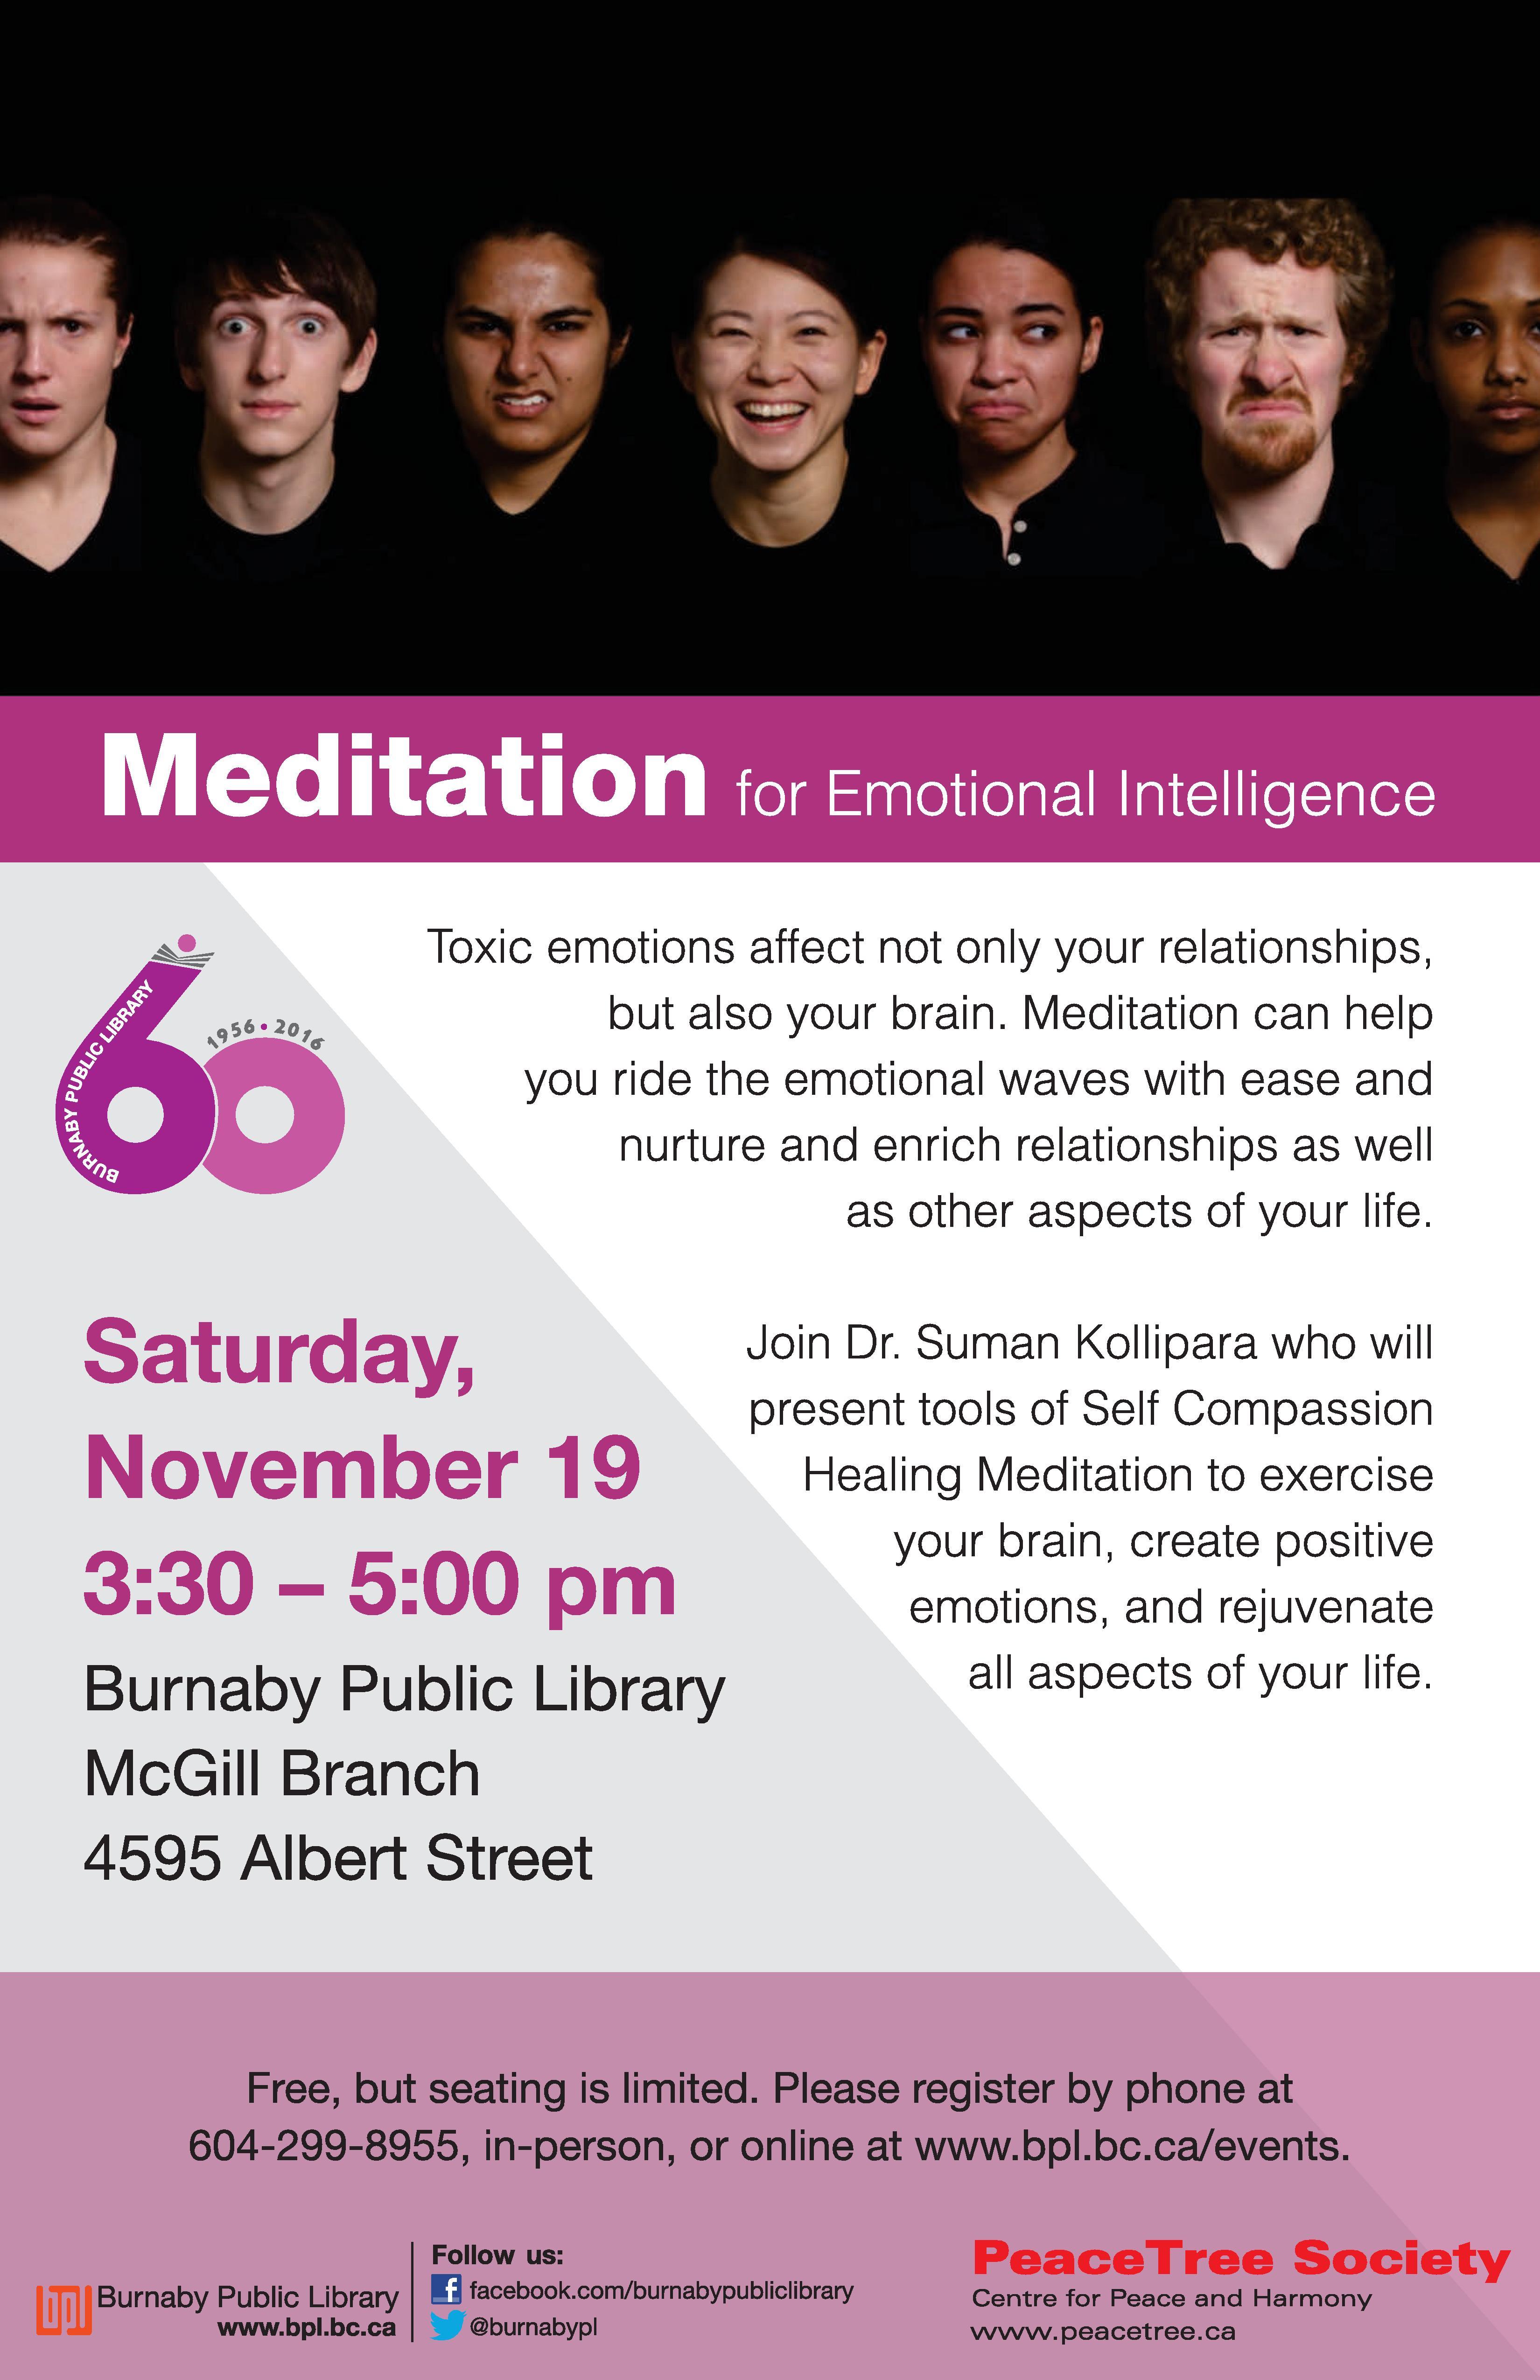 meditation-for-emotional-nov-2016-mcgill-page-001